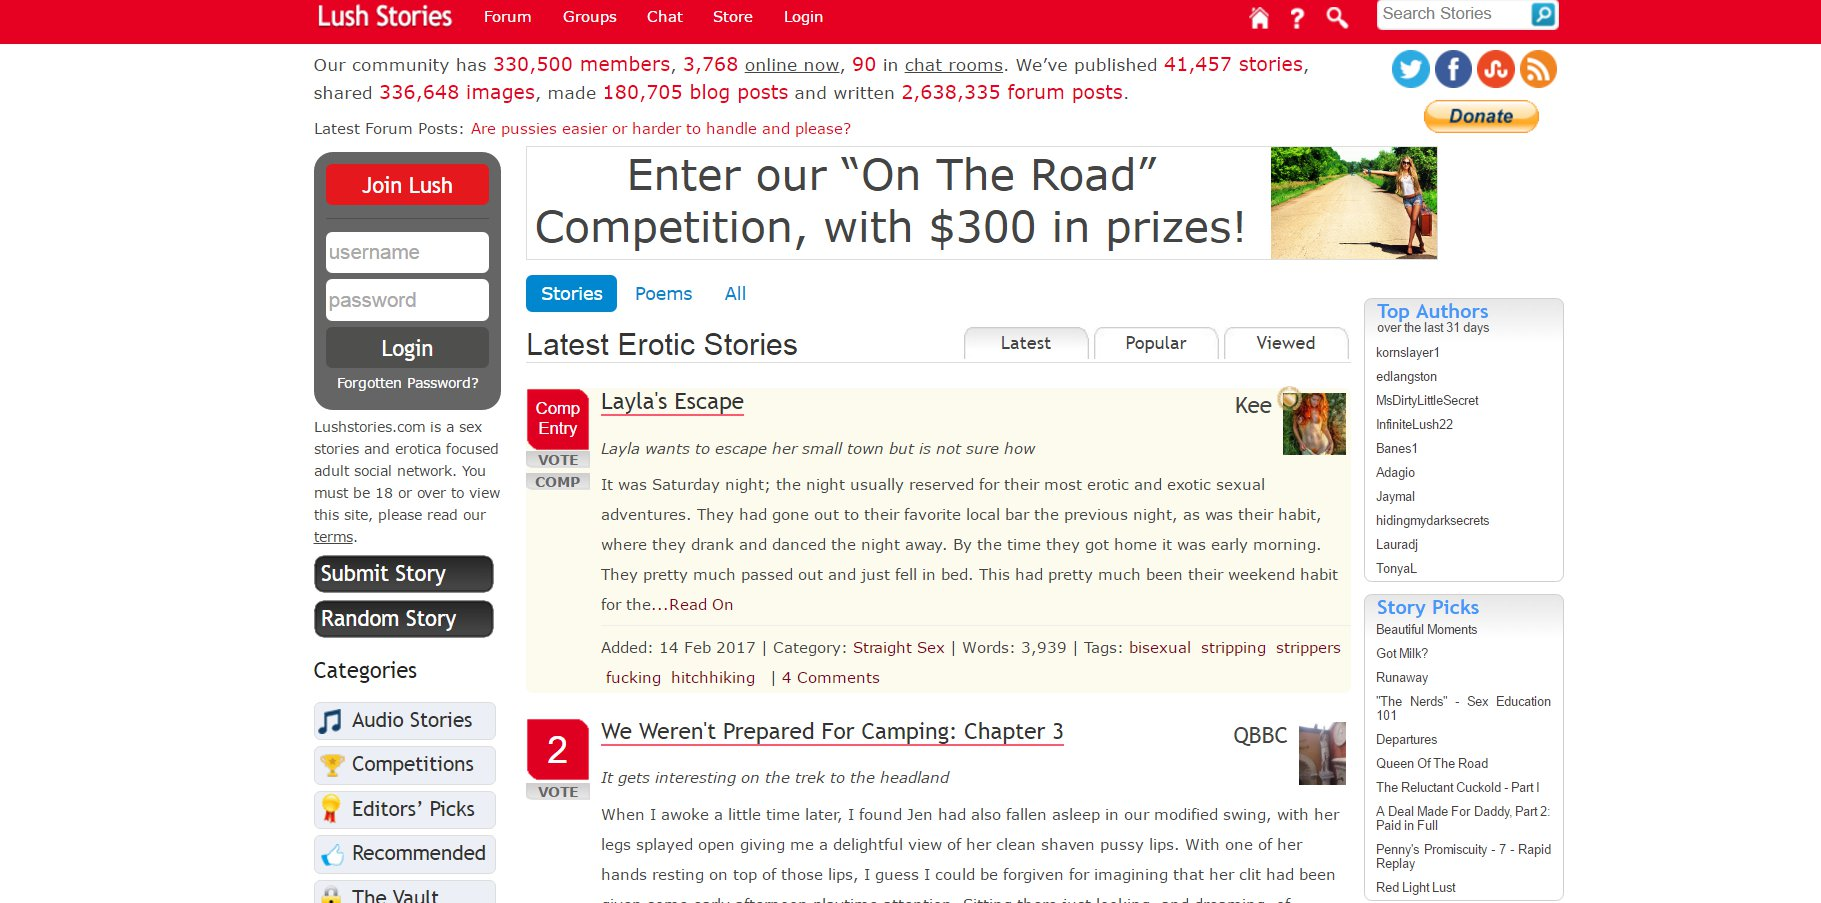 Lushstories.com